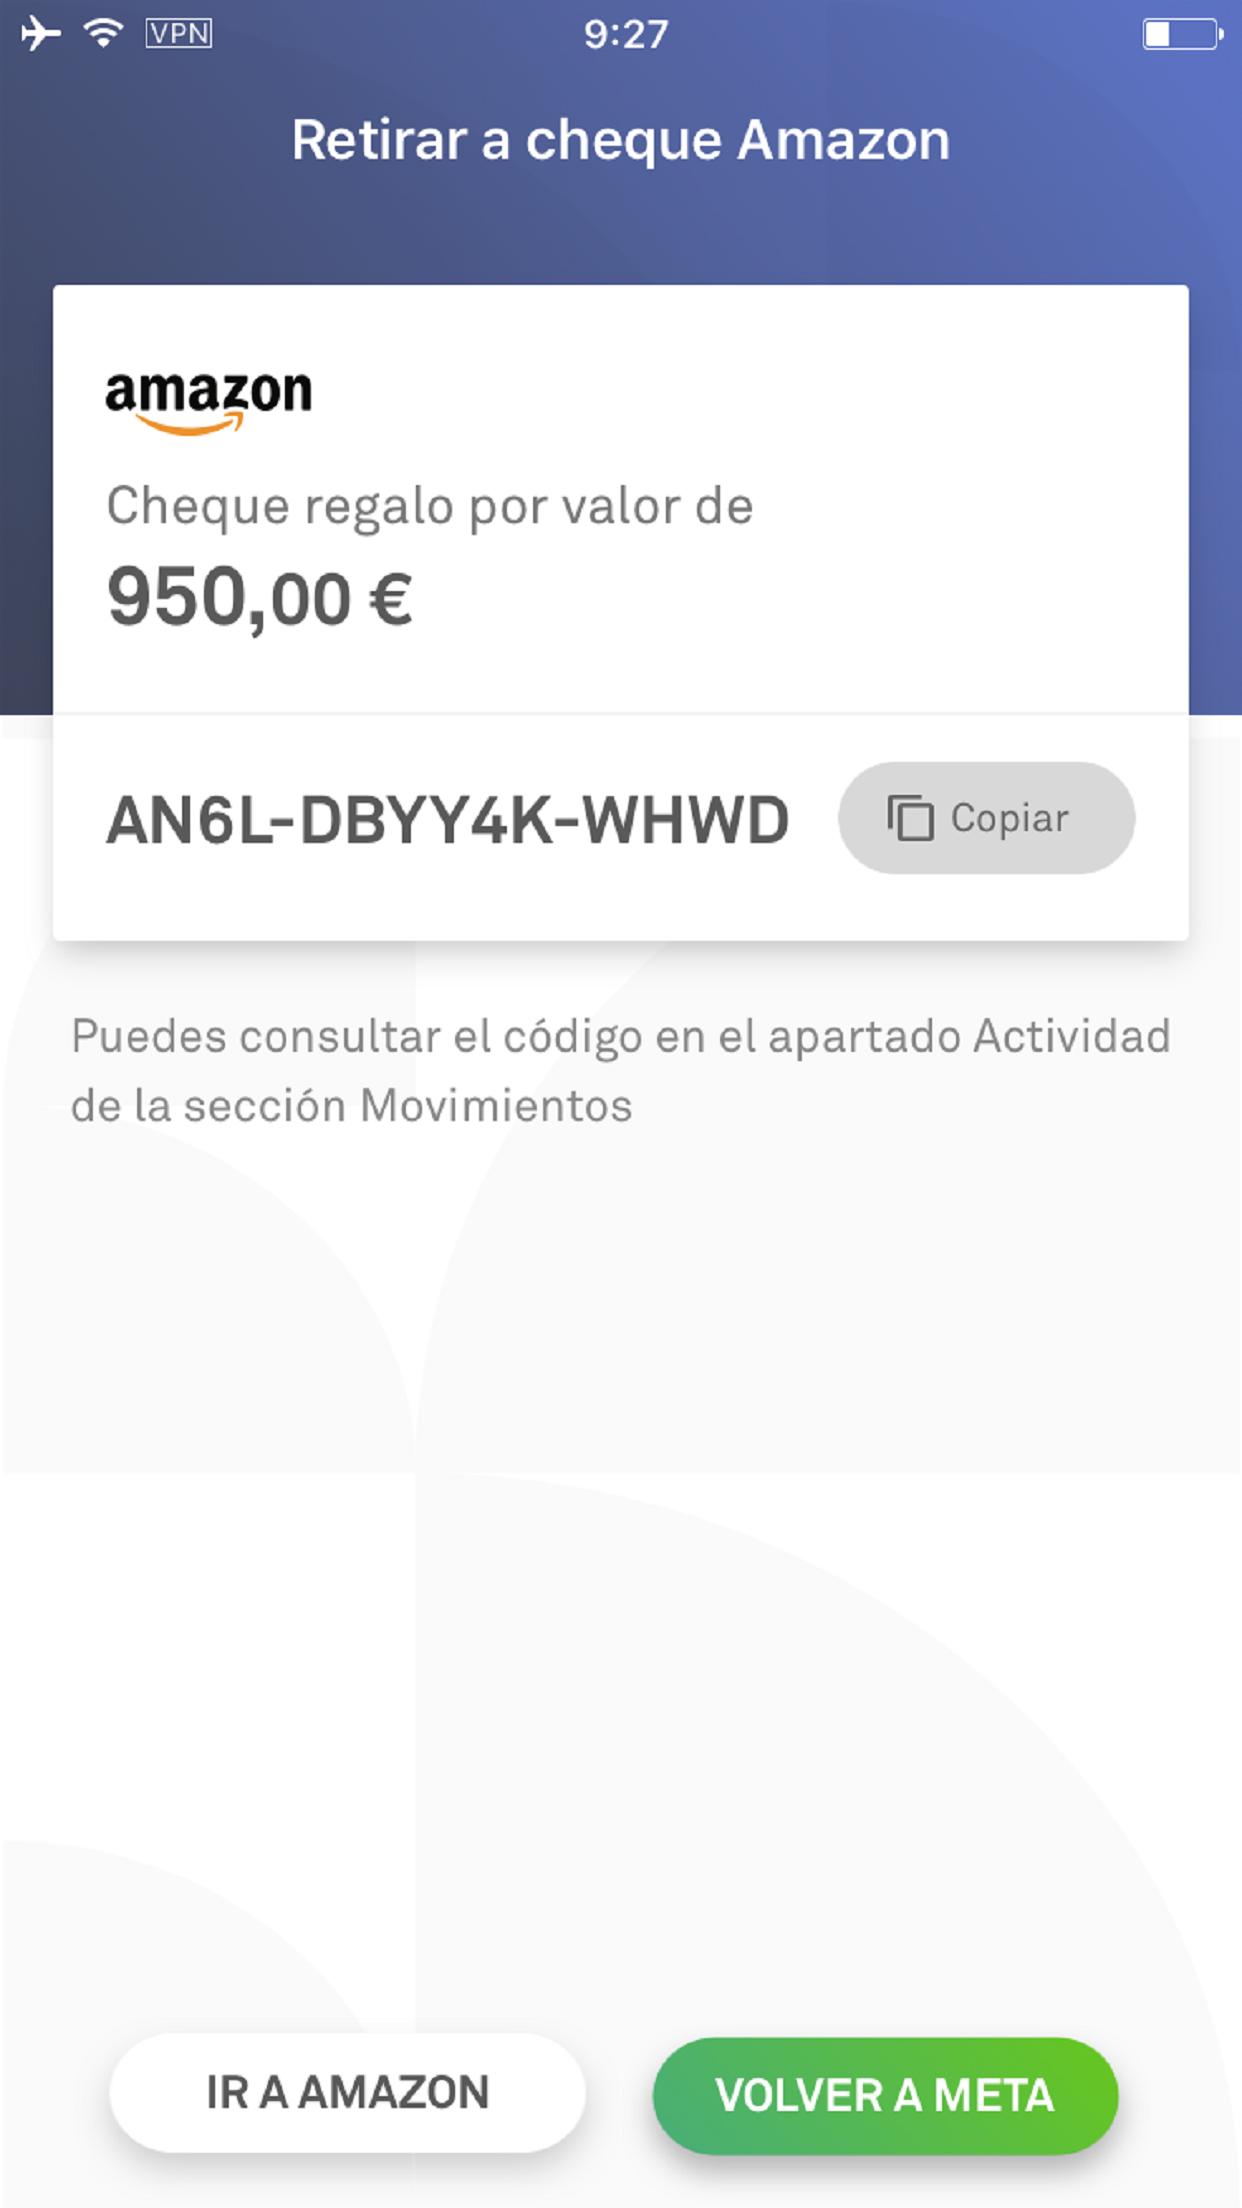 COMPRAR CHEQUE REGALO AMAZON.DE